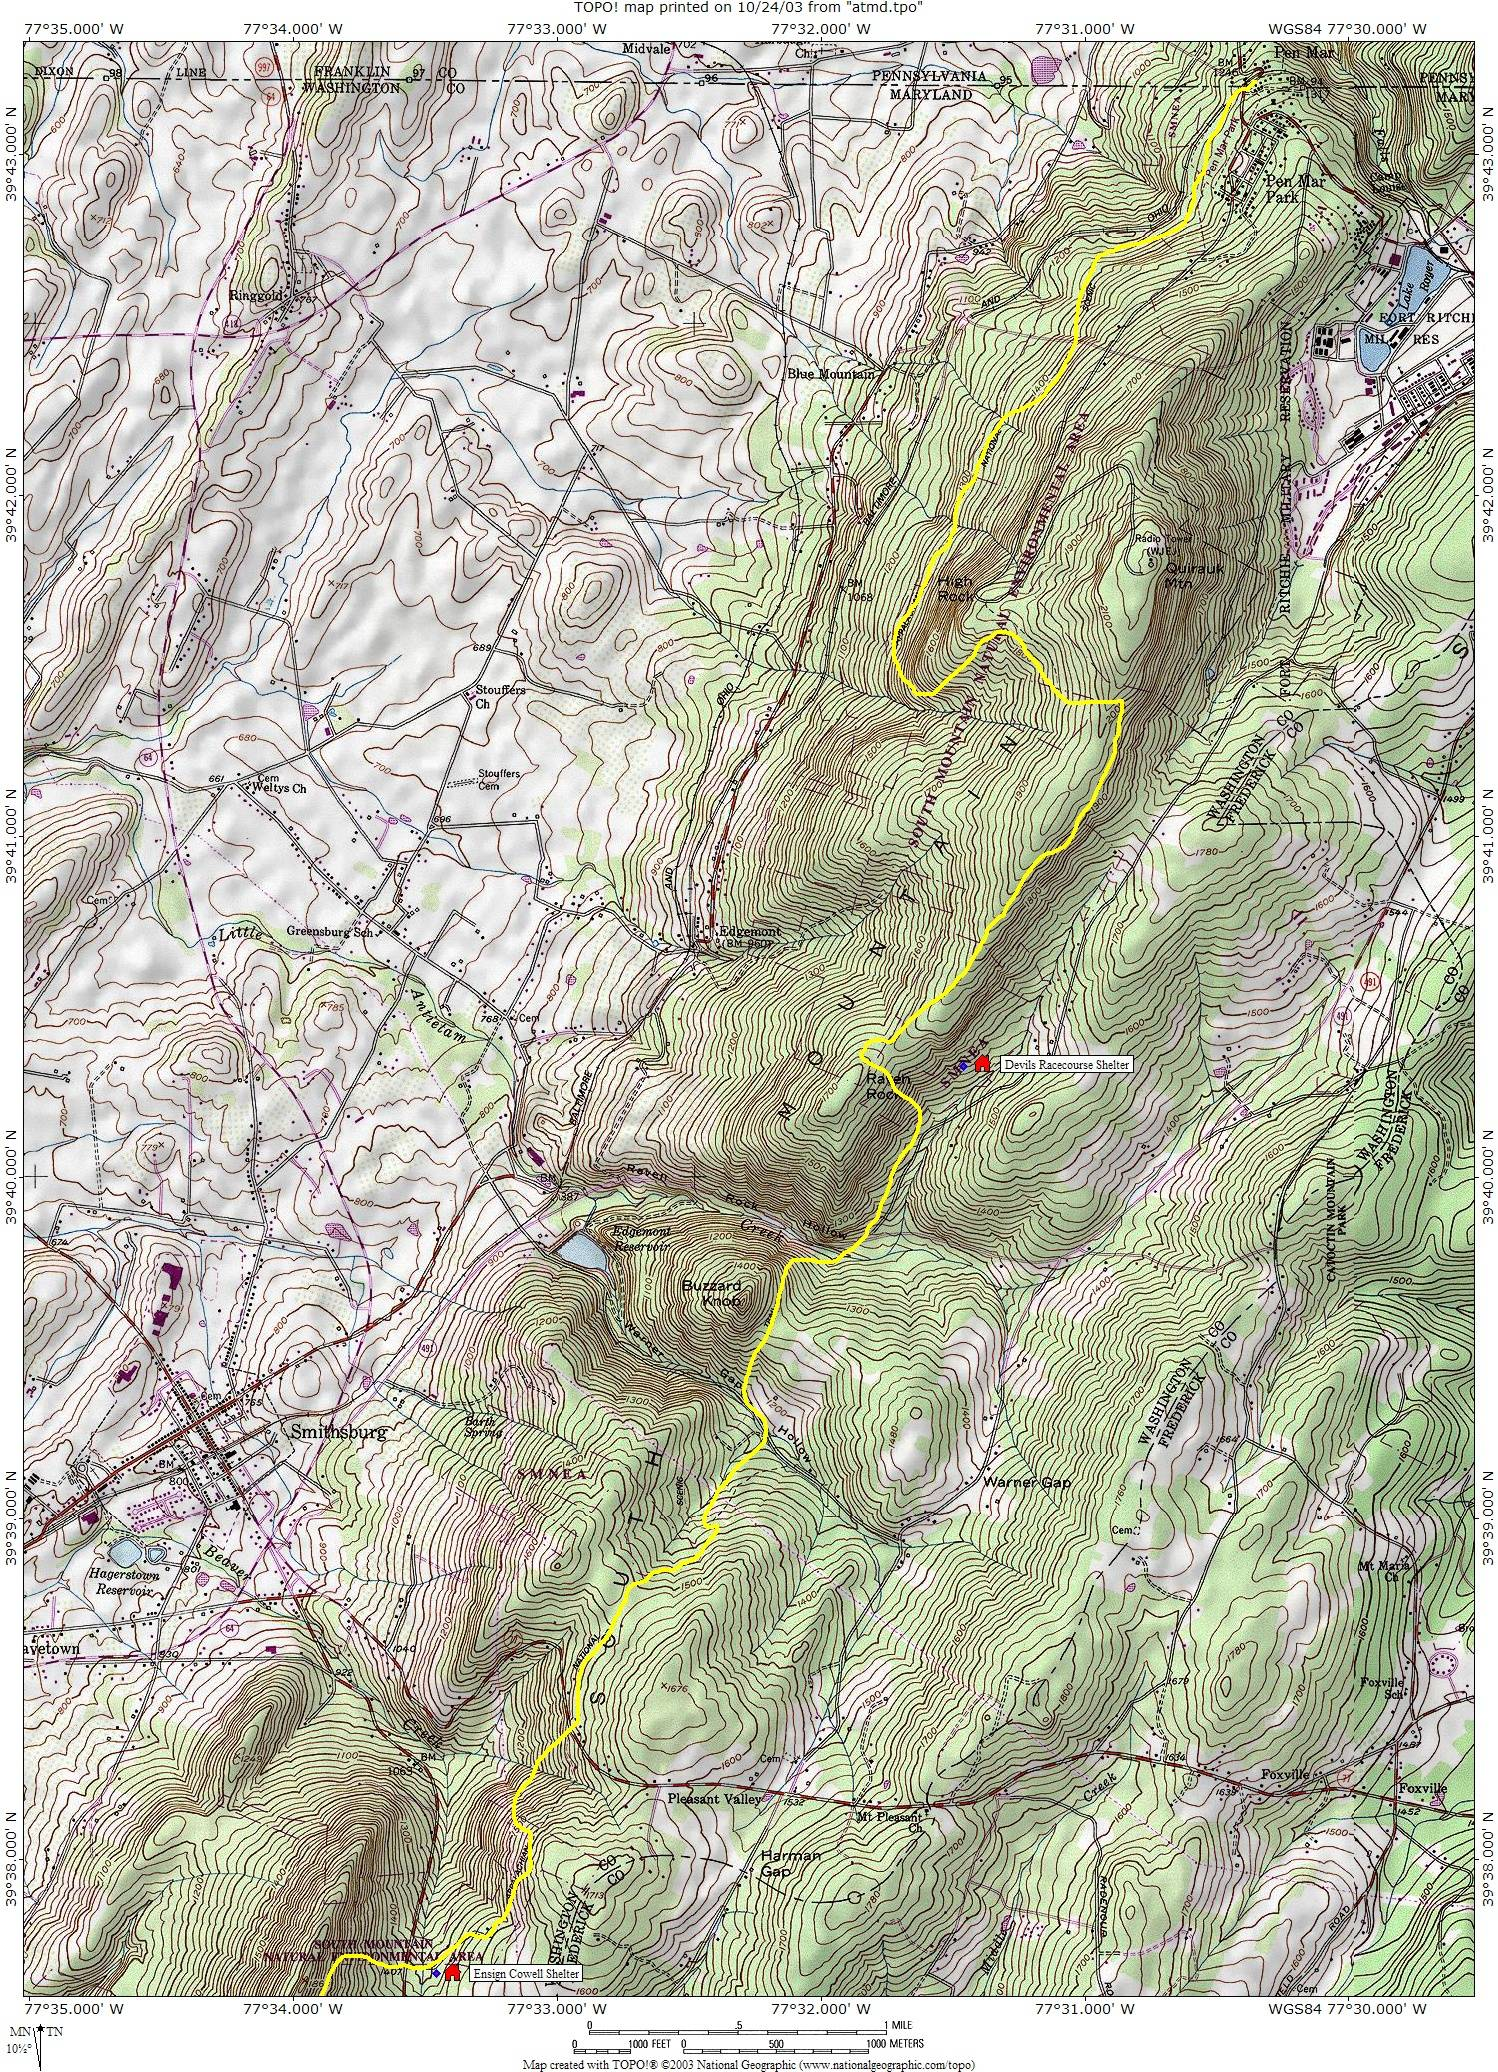 Running the Maryland Appalachian Trail